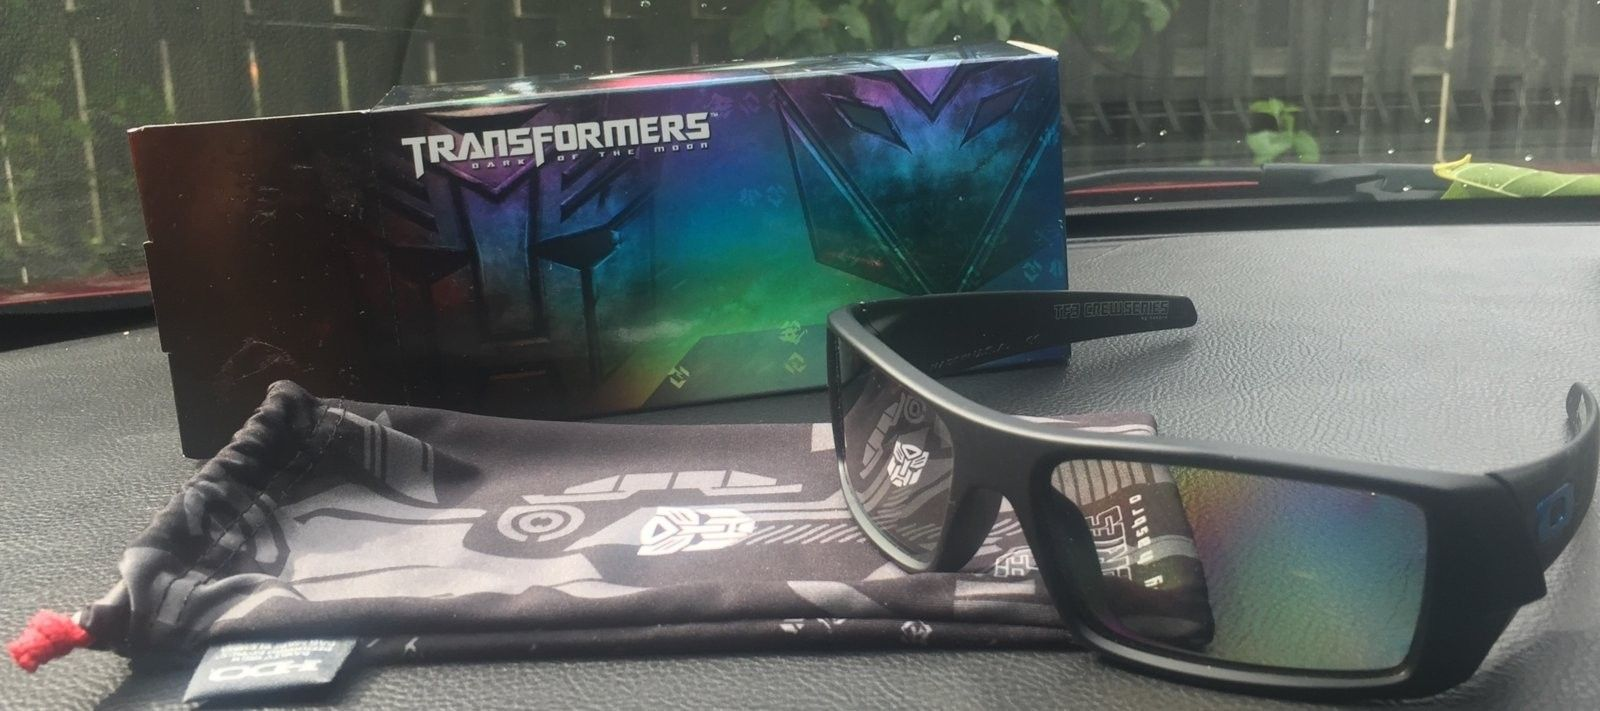 Transformers gascans nib trade for xmetals - image.jpeg